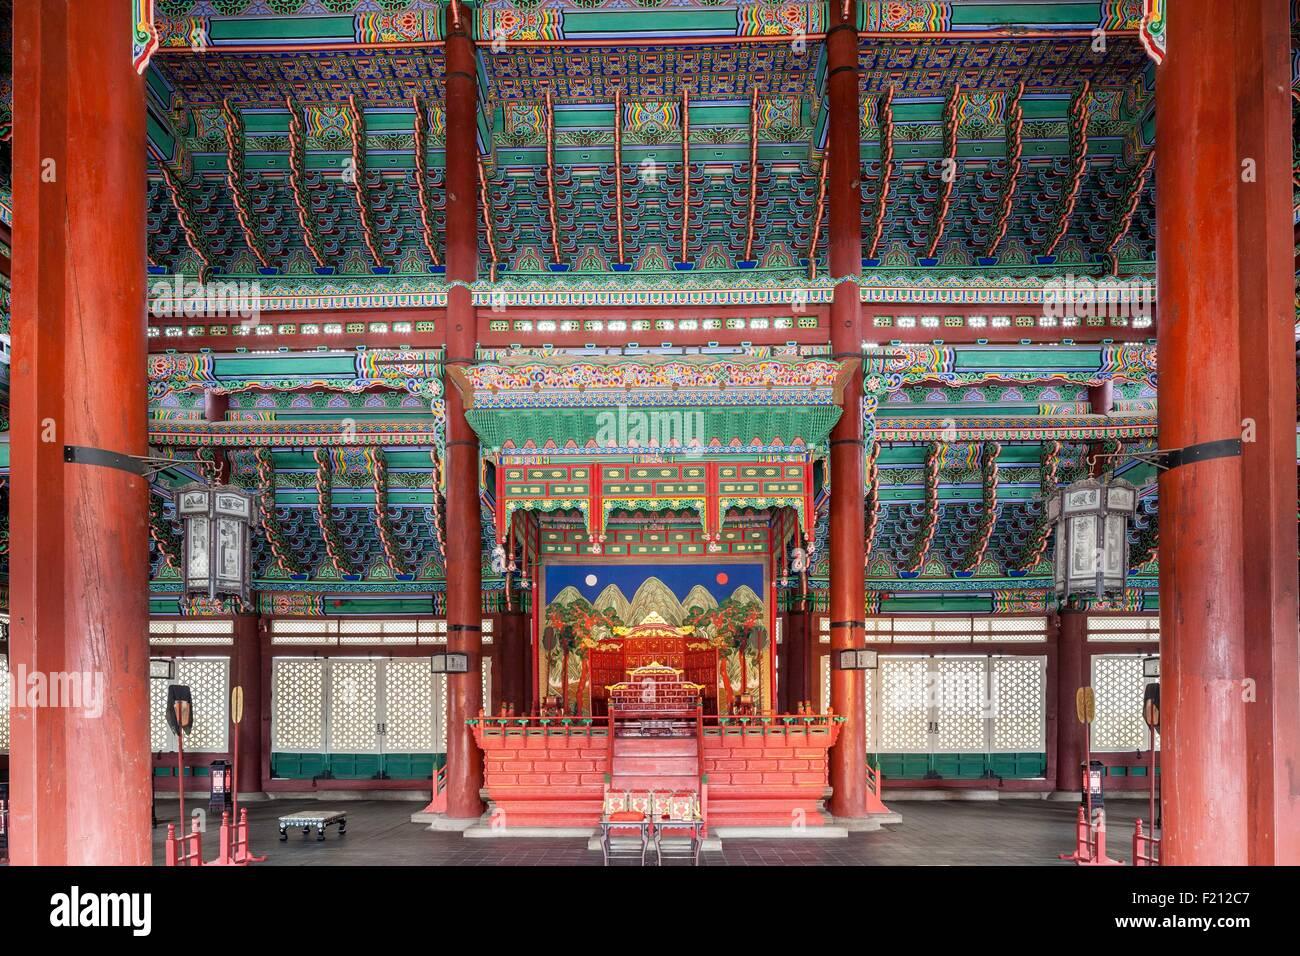 South Korea, Seoul, Jongno-gu, Gyeongbokgung Palace, royal palaces built during the Joseon Dynasty, throne room - Stock Image